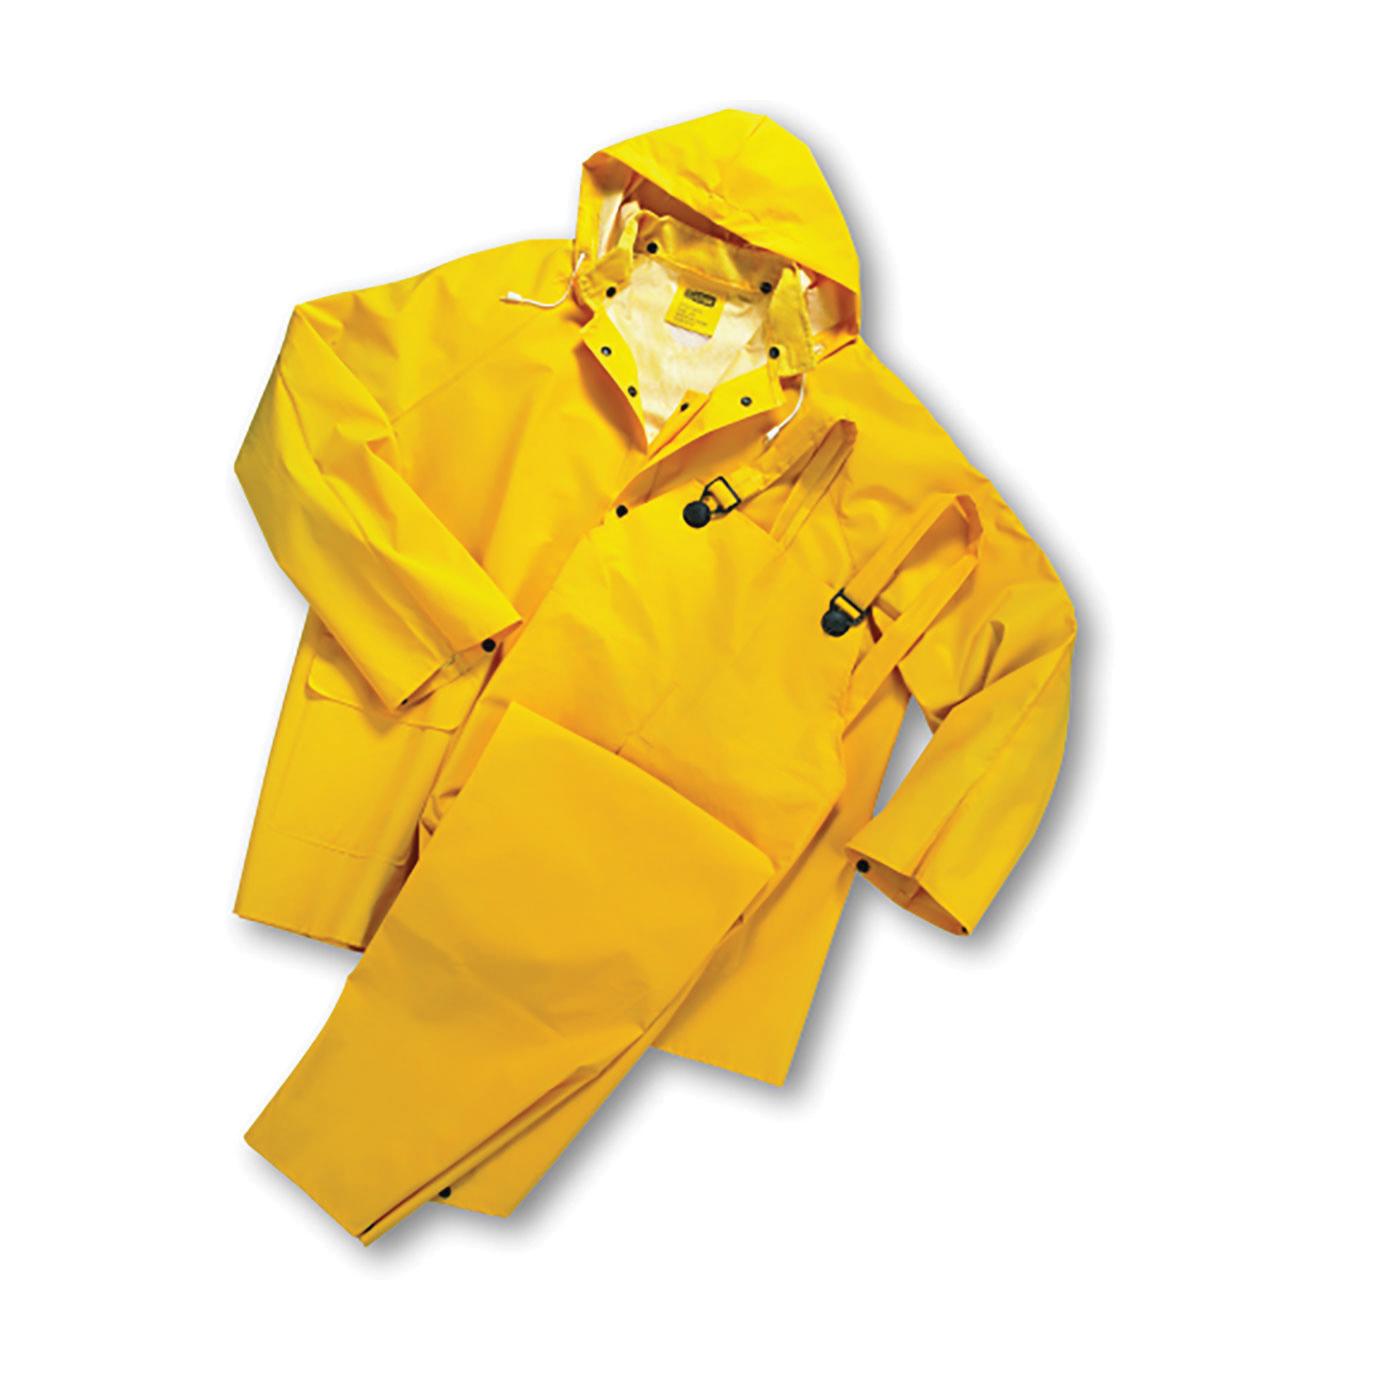 PIP® 4035/7XL 3-Piece Rainsuit, 7XL, Yellow, Polyester/PVC, 62 in Waist, 34 in L Inseam, Drawstring Hood